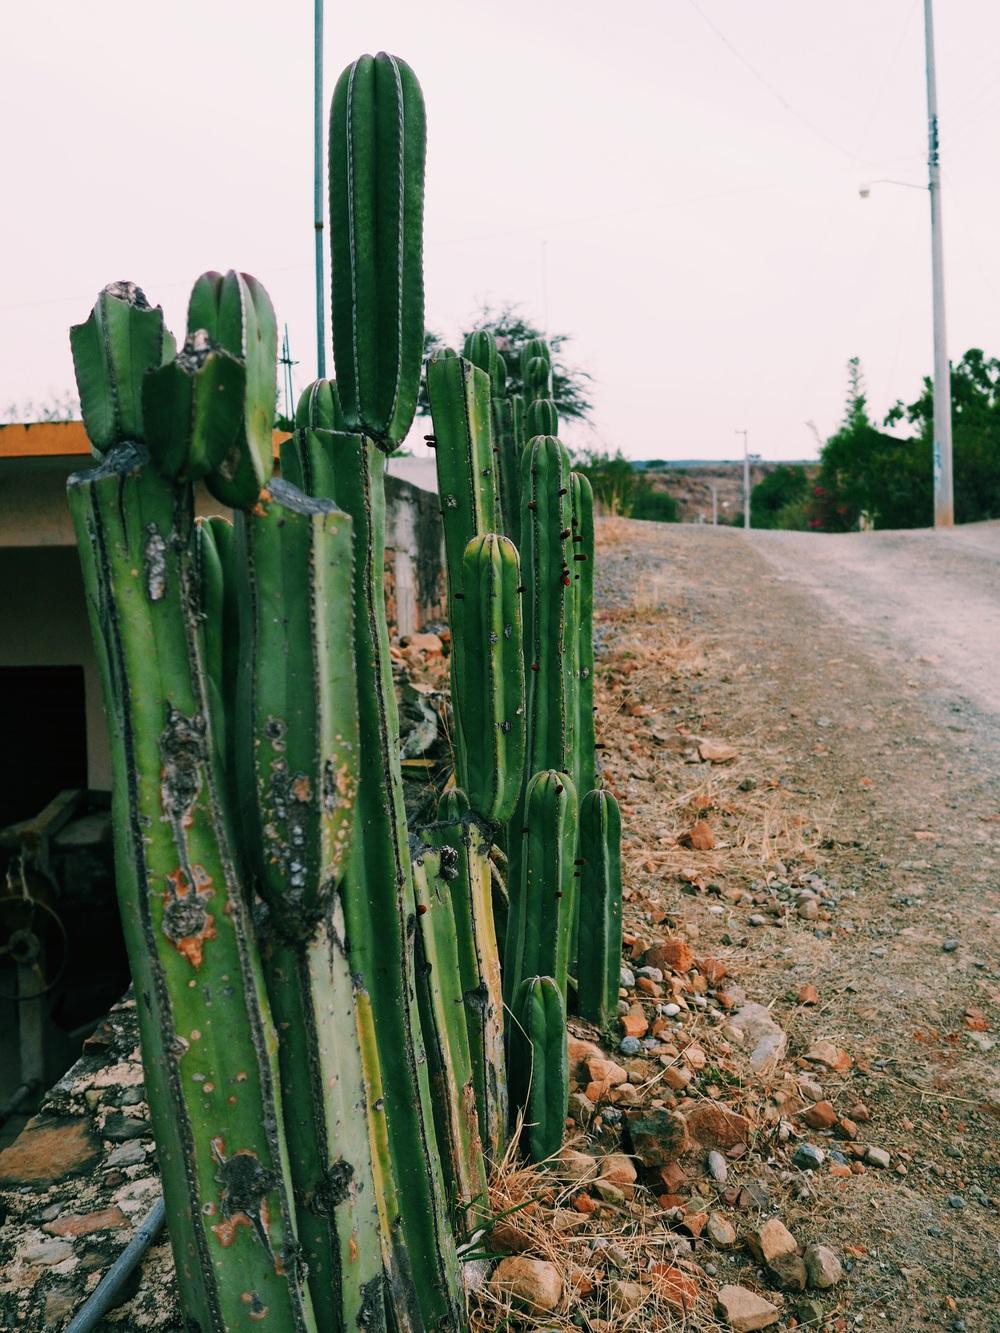 Loving these cacti!